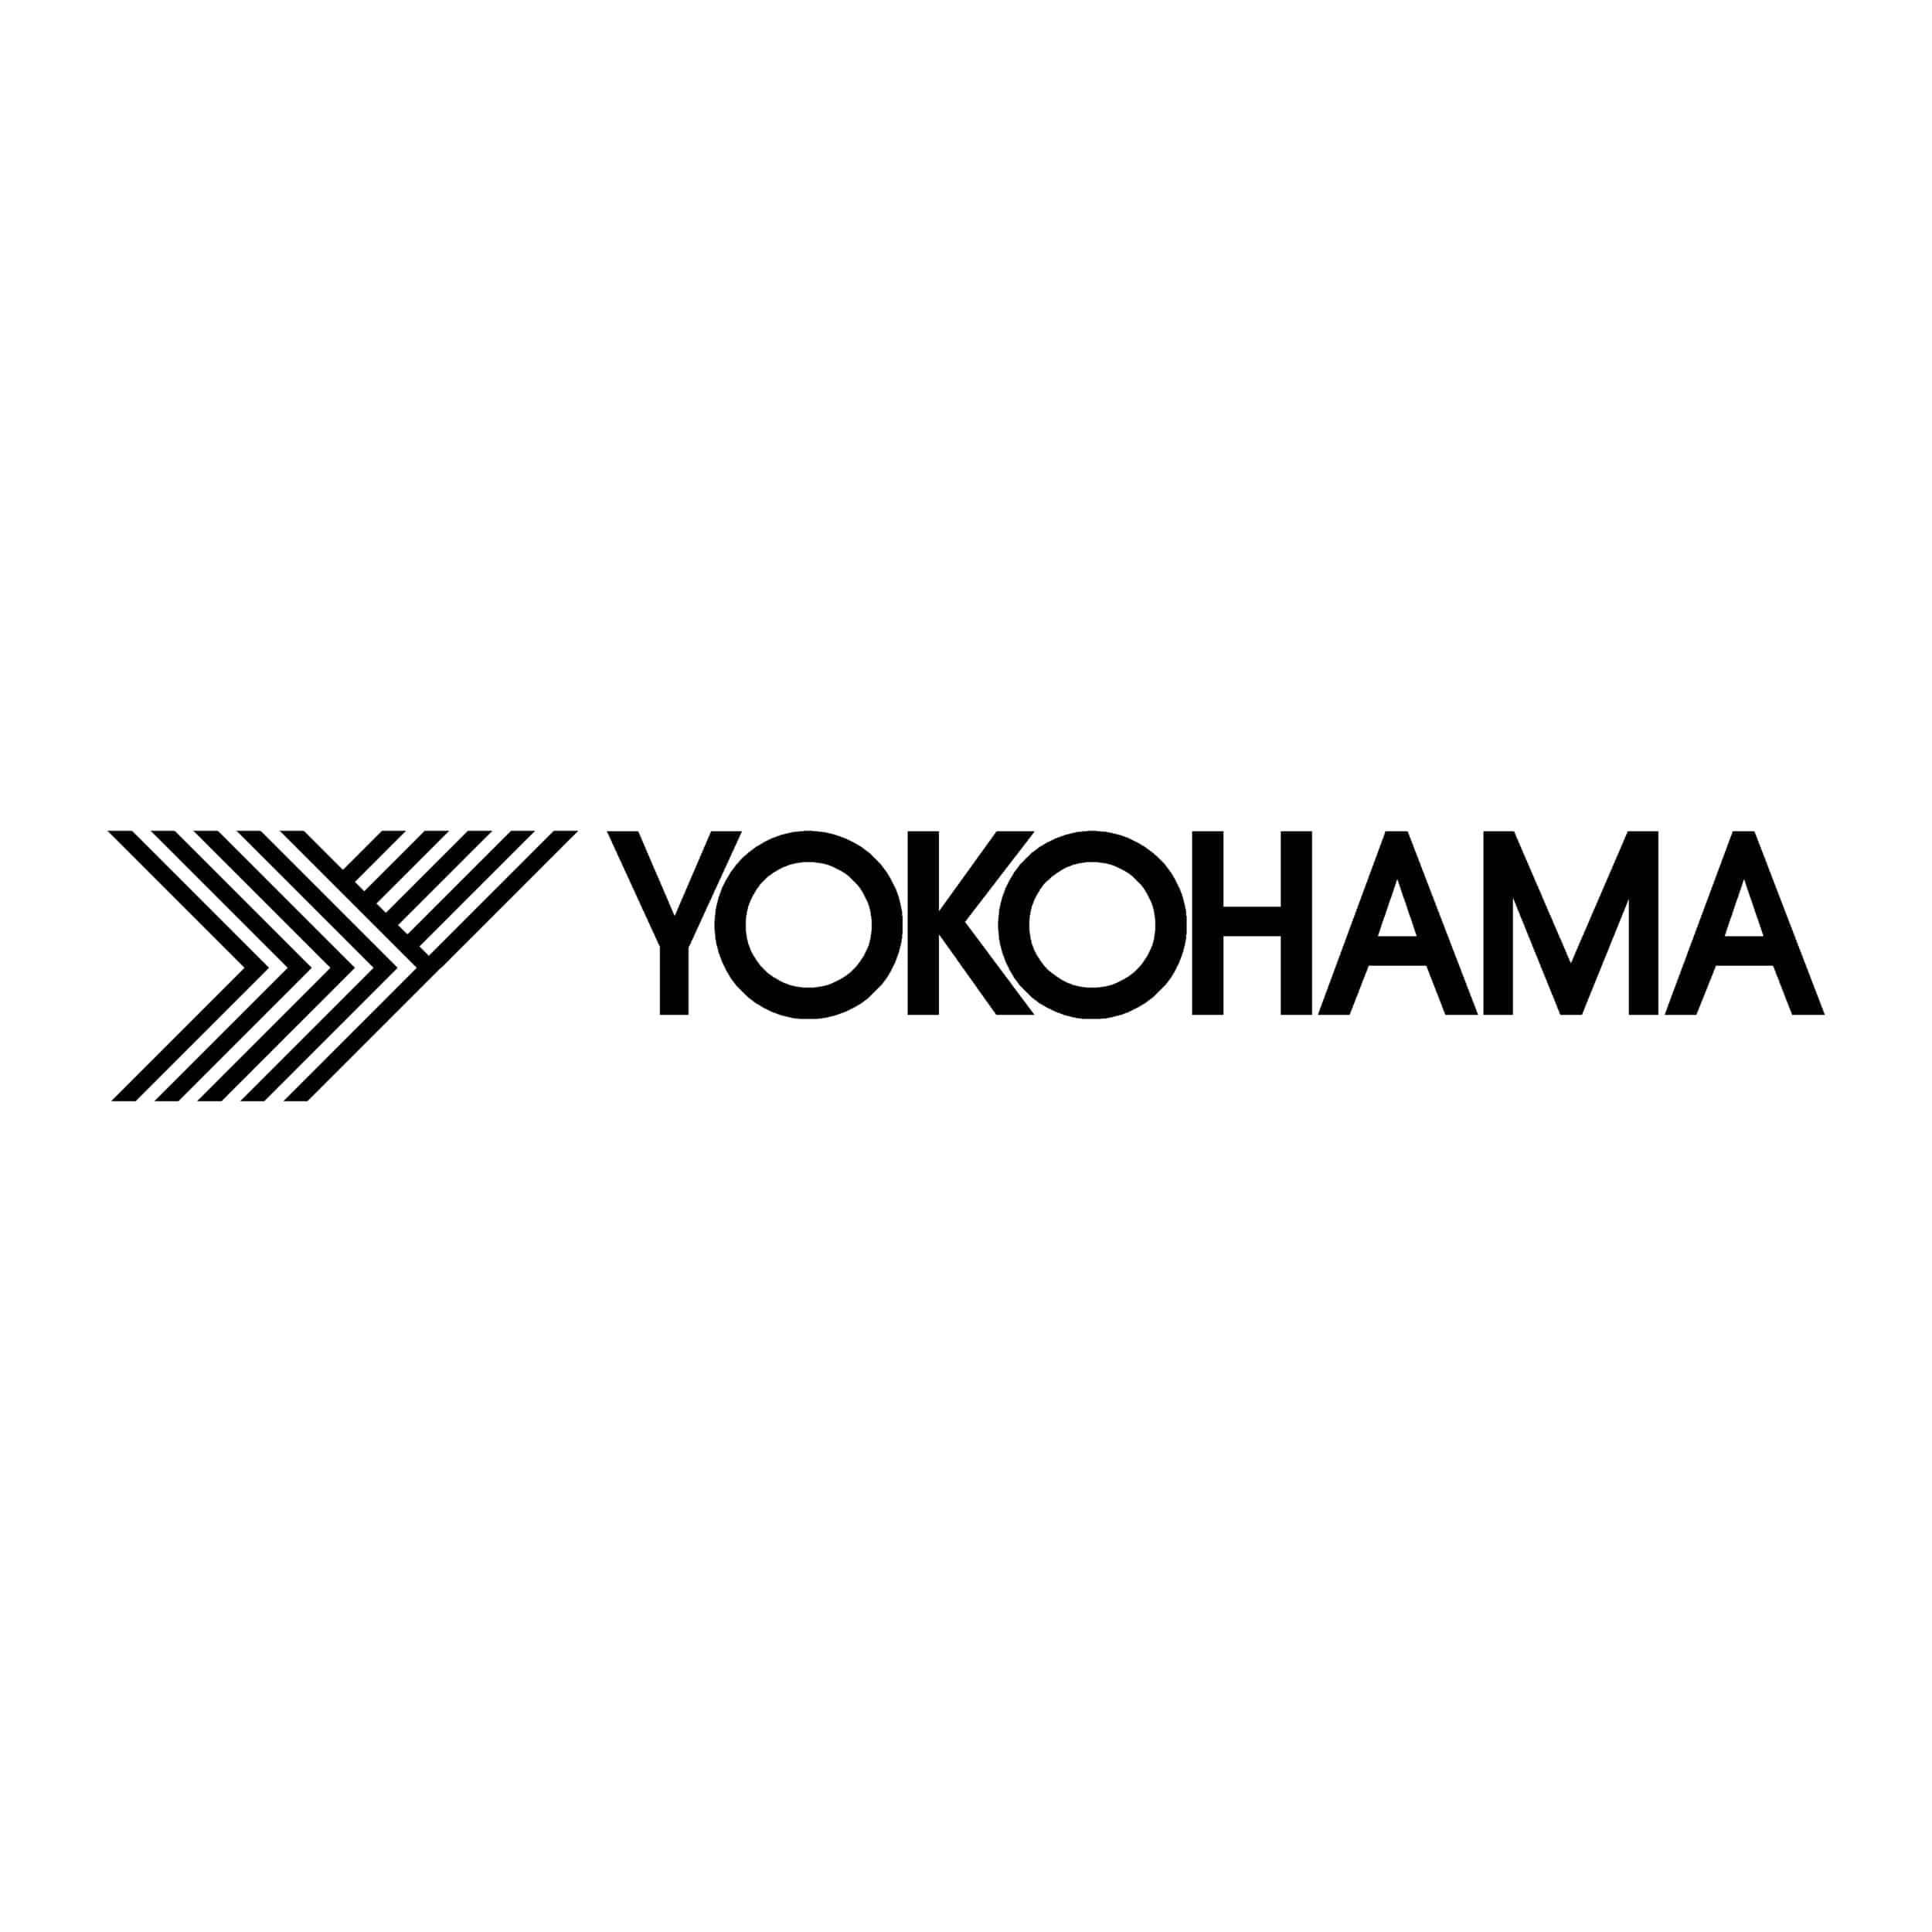 stickers-yokohama-ref-1-tuning-audio-sonorisation-car-auto-moto-camion-competition-deco-rallye-autocollant-min